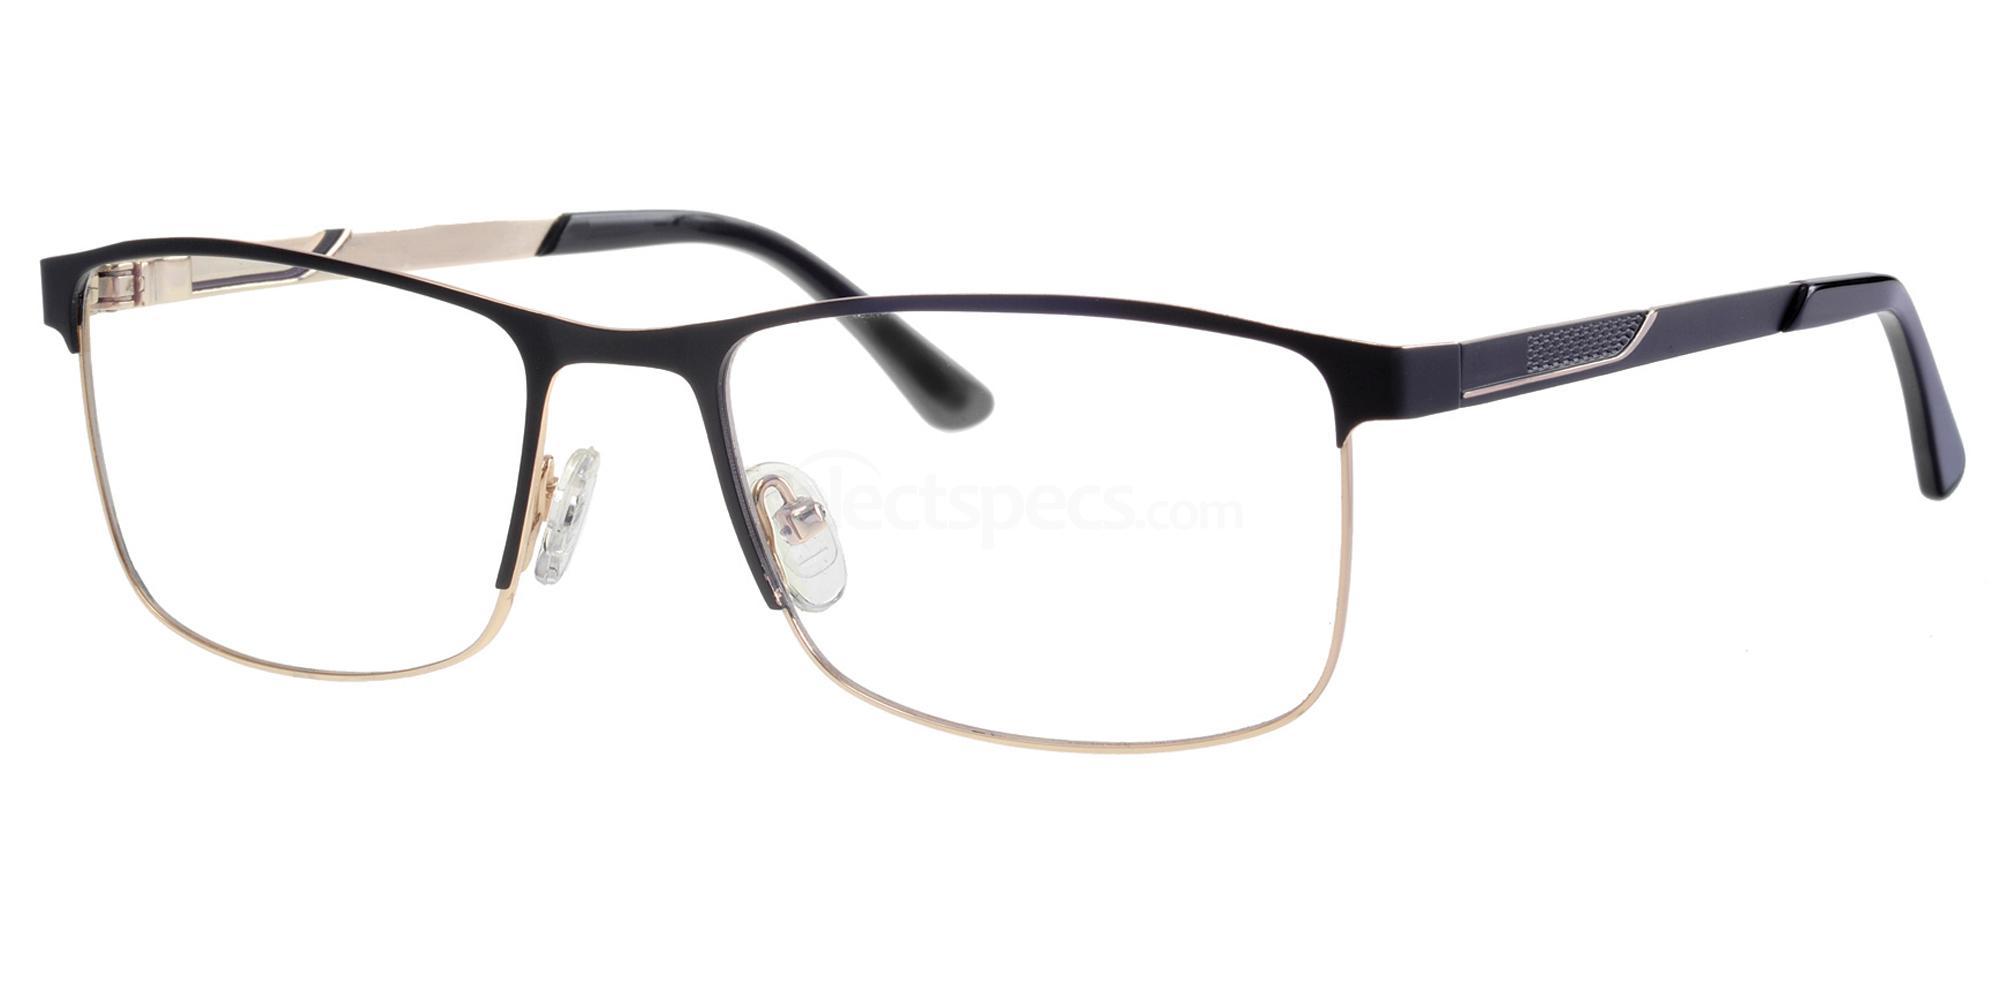 C01 3537 Glasses, Colt for Men